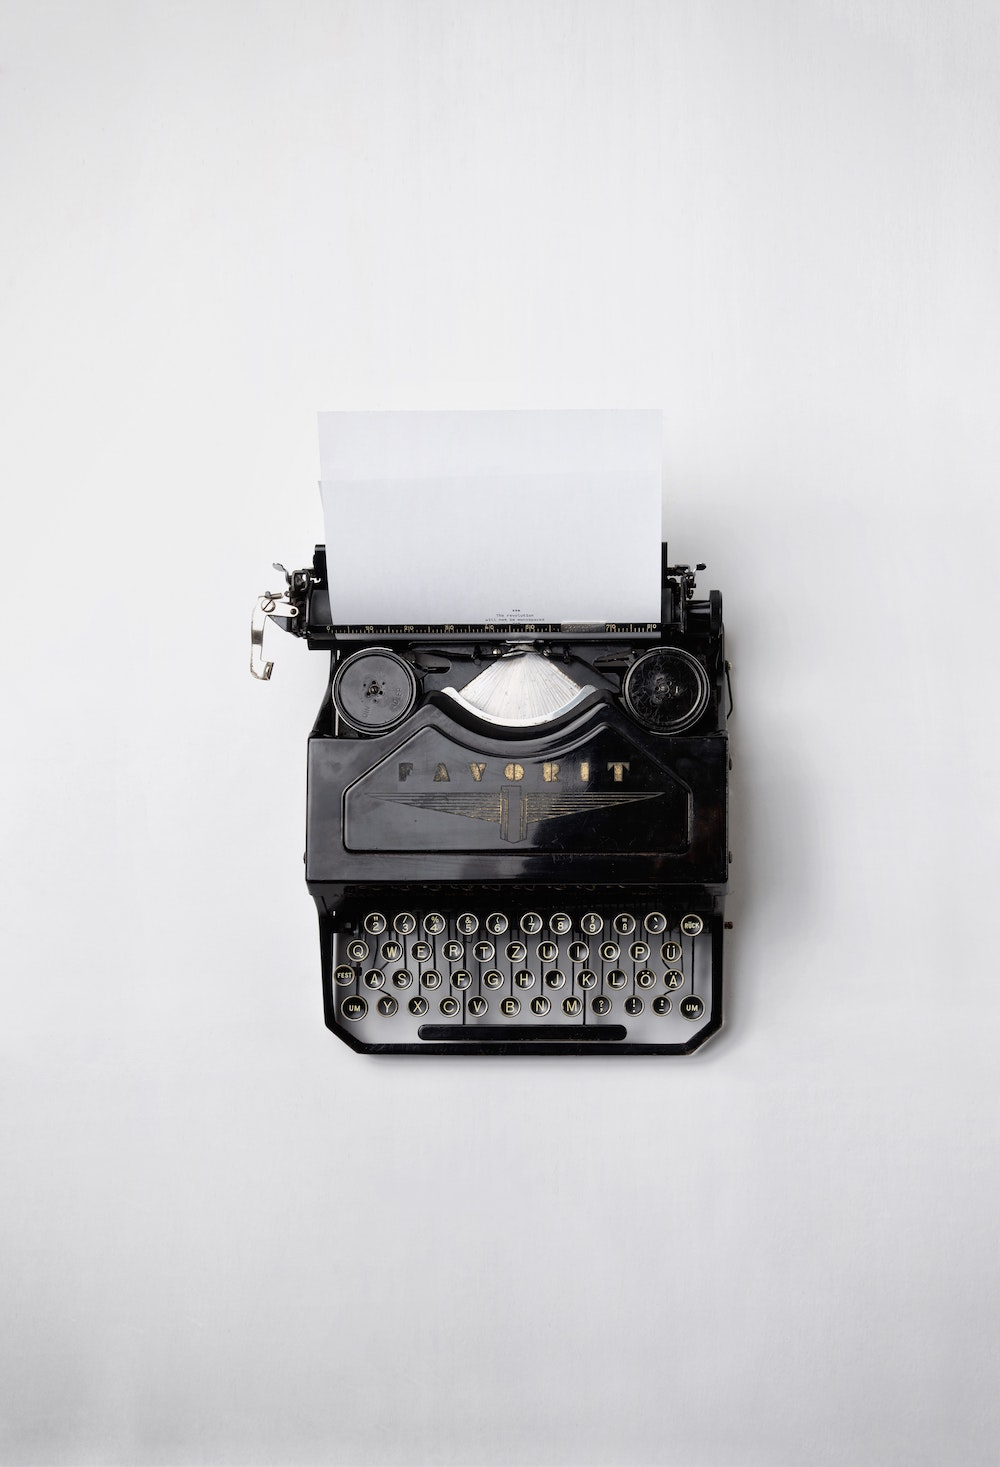 typewriter-unsplash